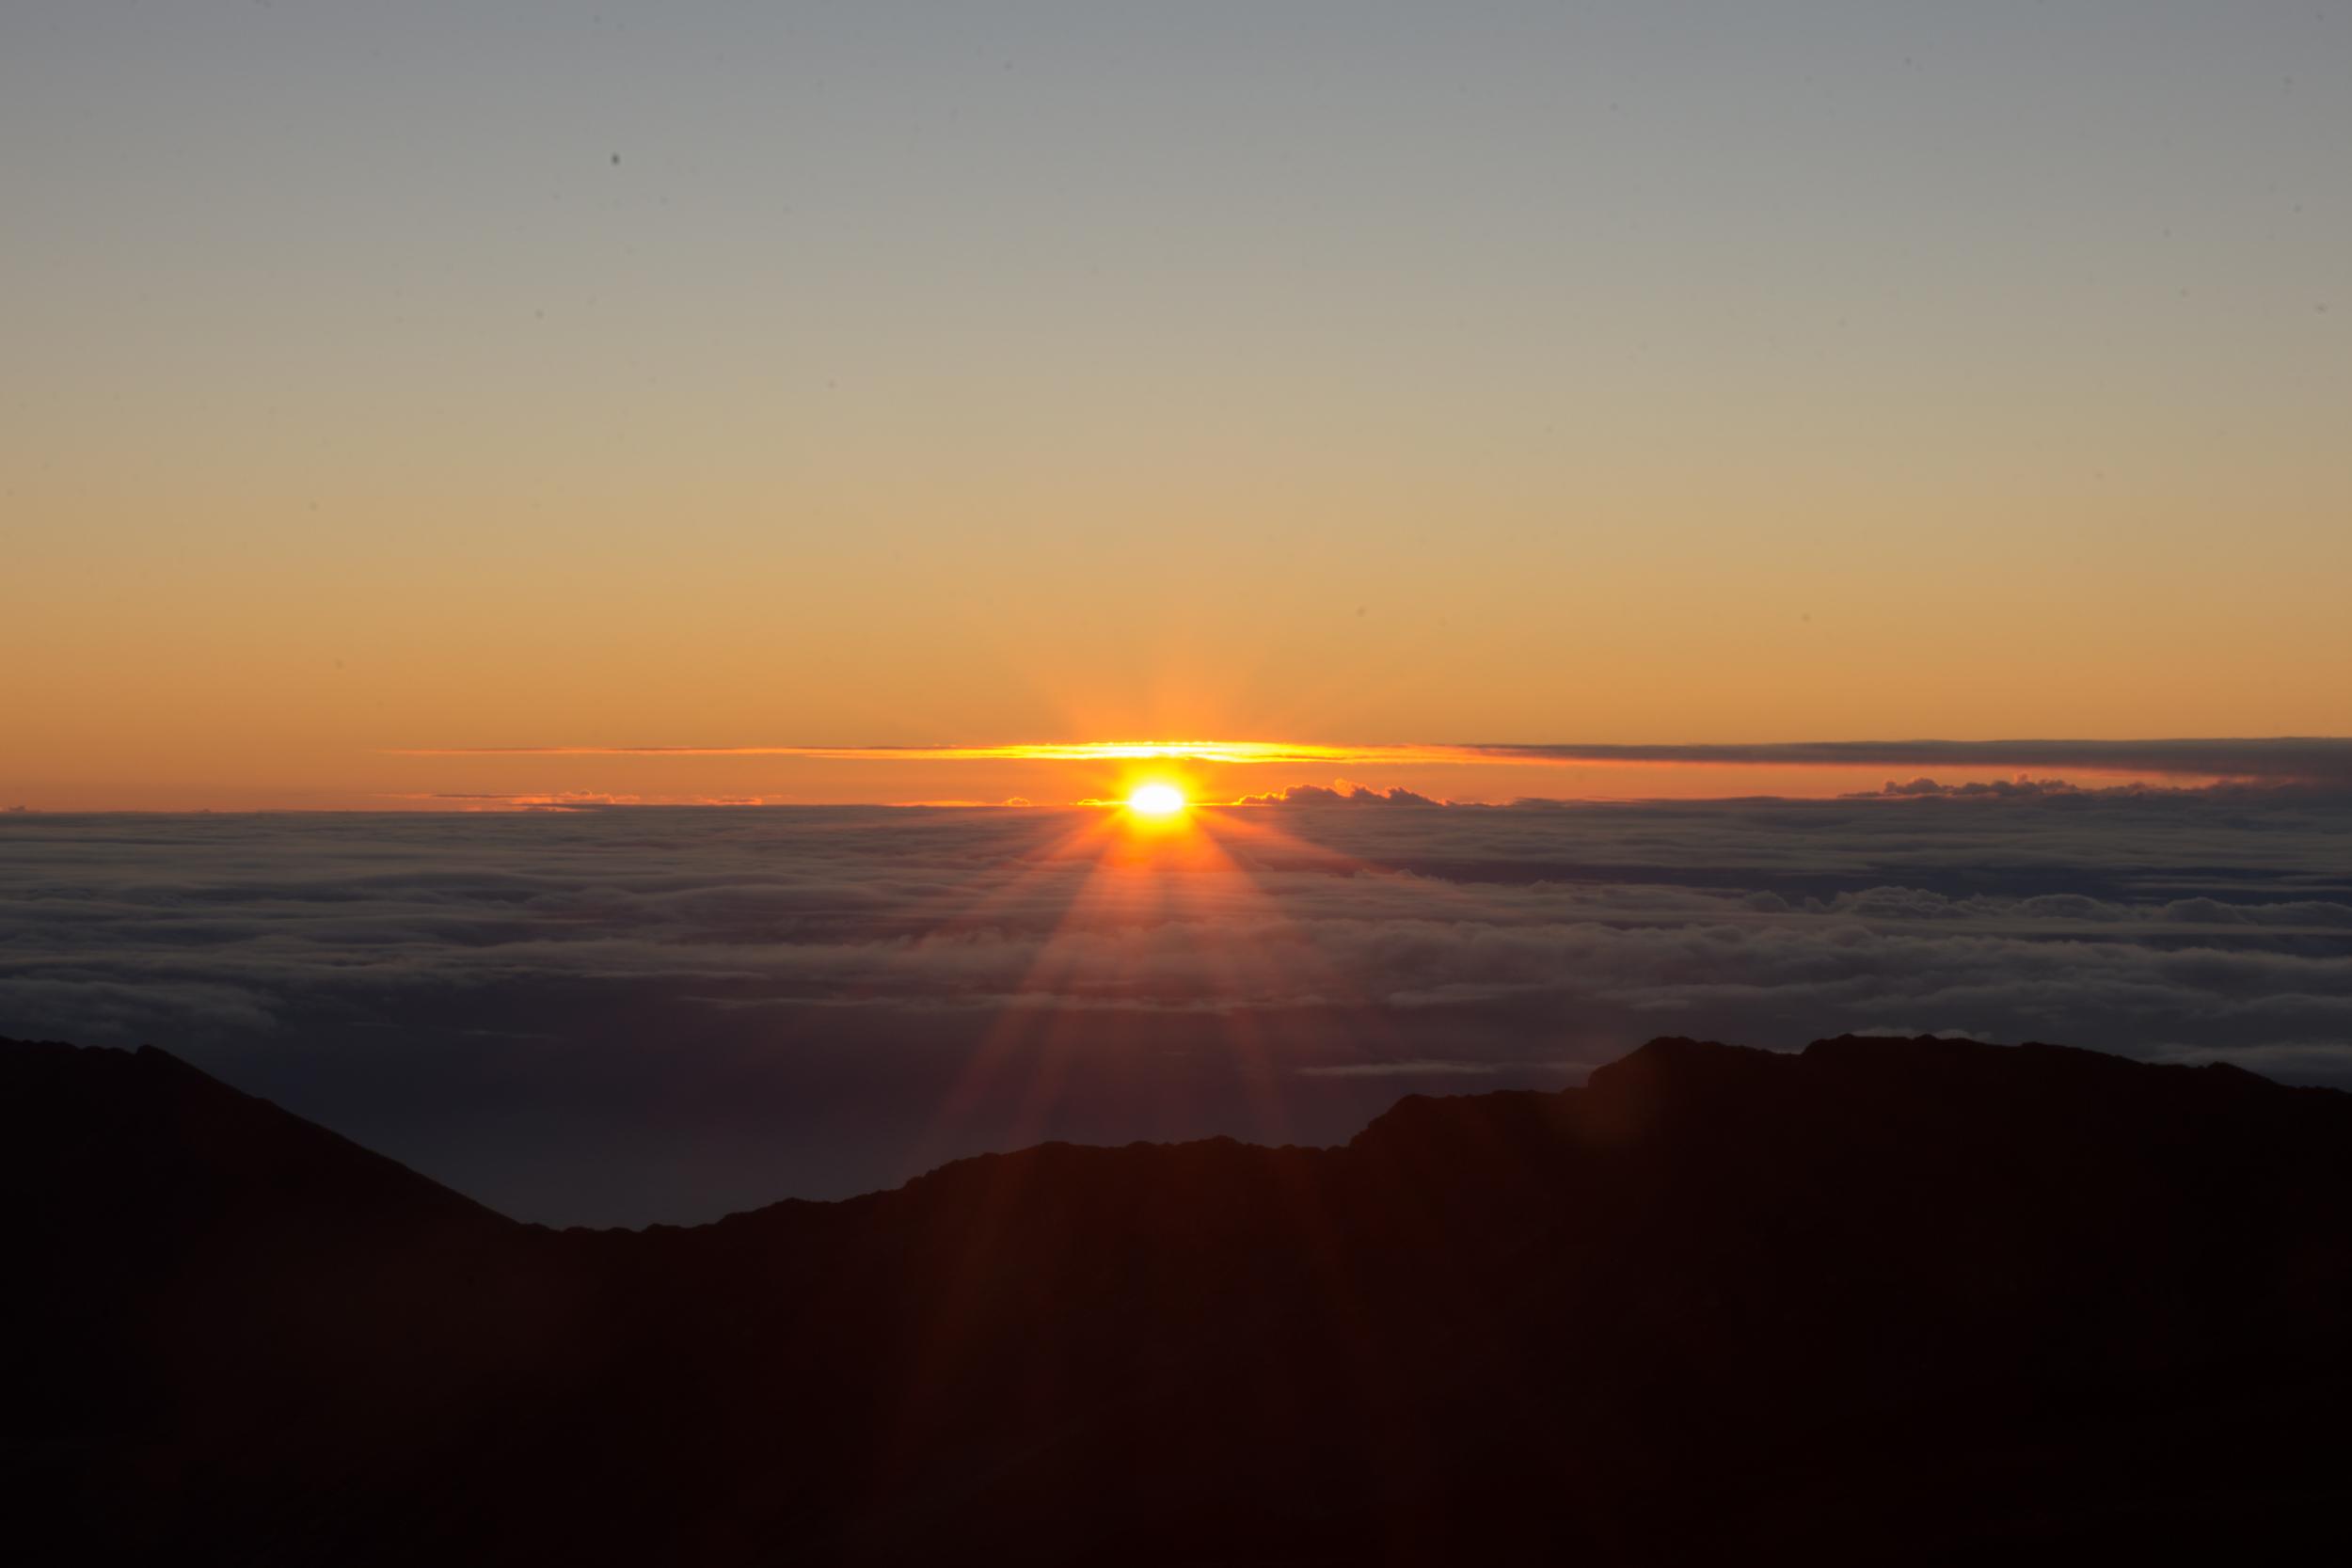 Sun Peaking at Mount Haleakala